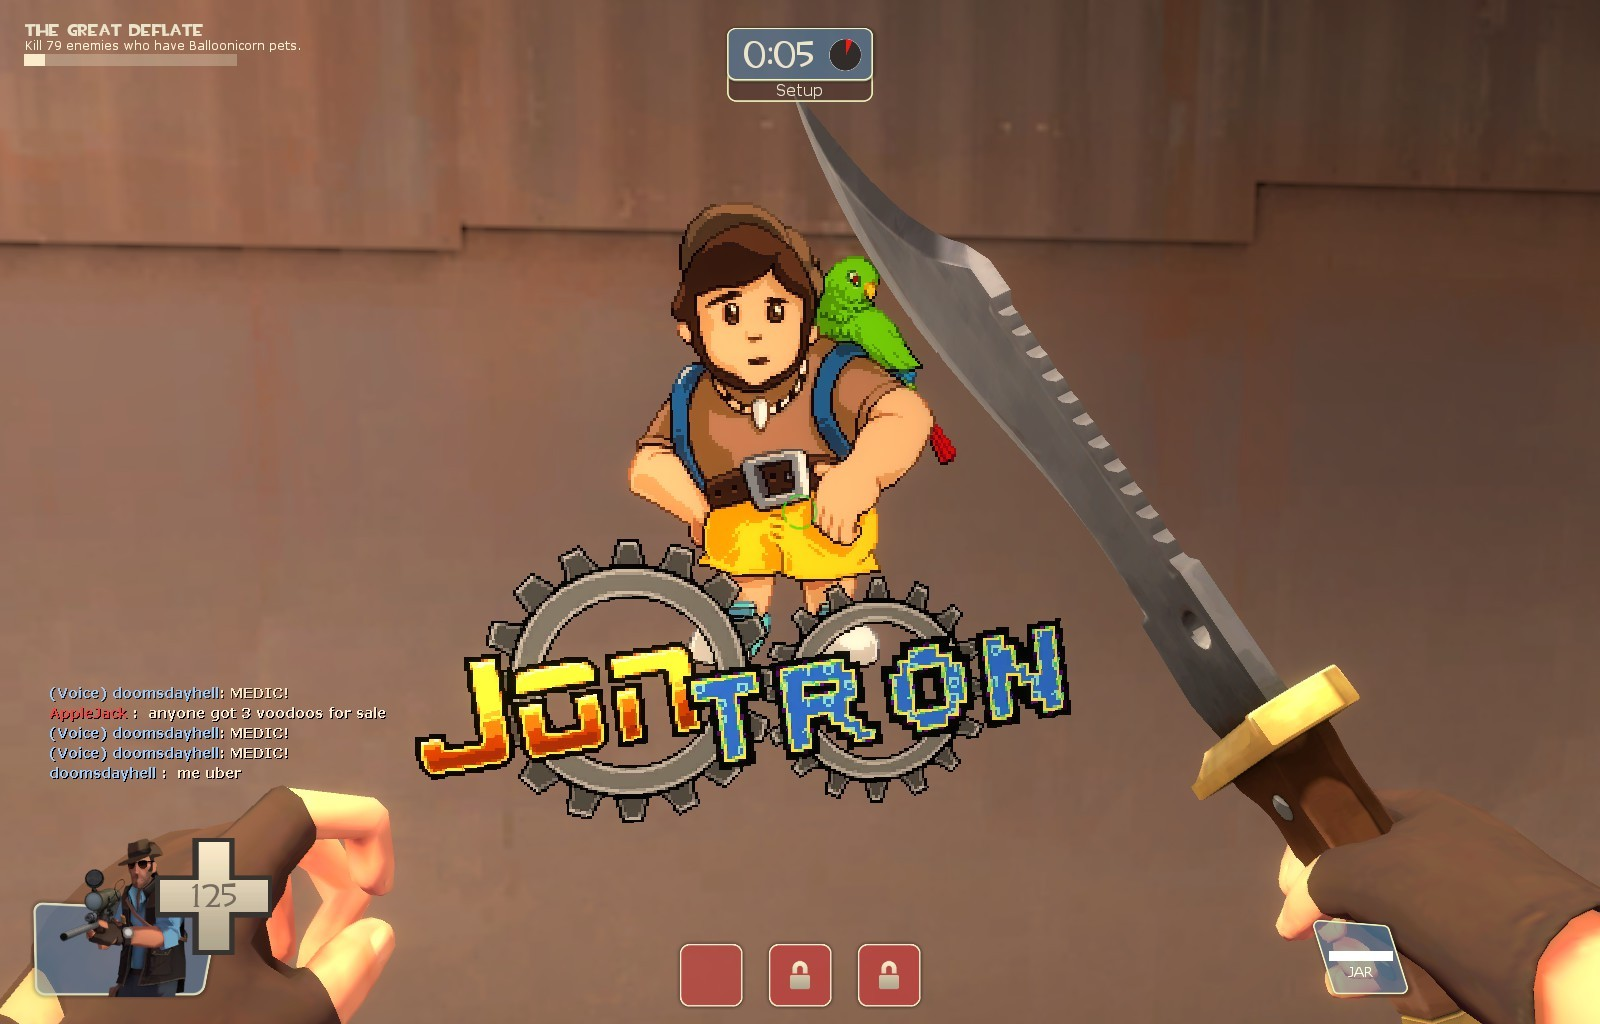 jontron animated logo spray  team fortress 2   sprays